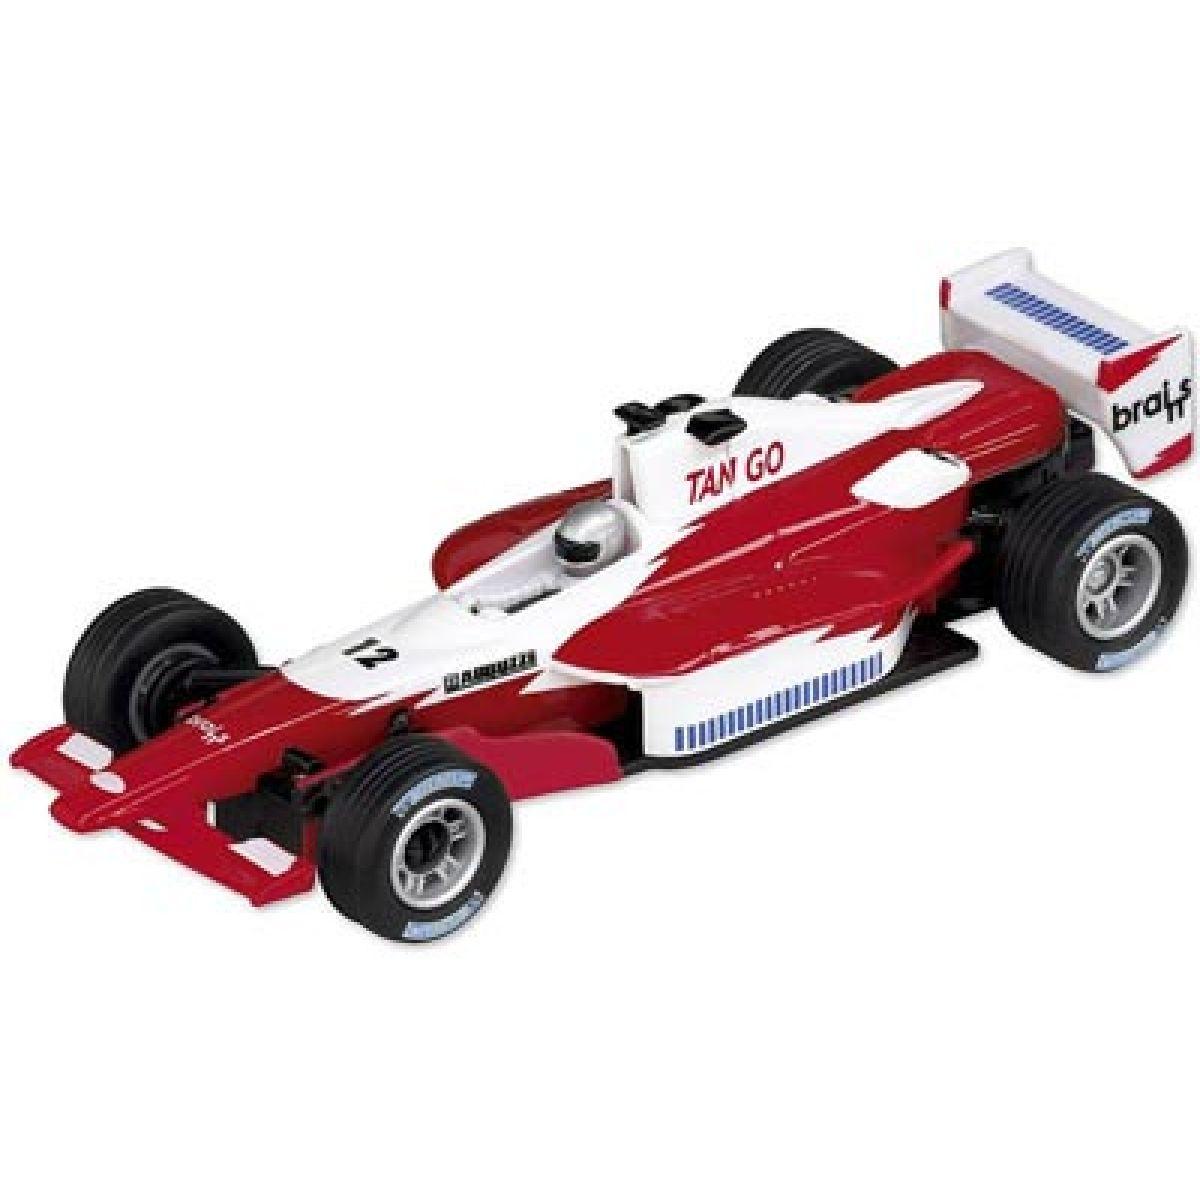 Carrera Formula 1 - type T